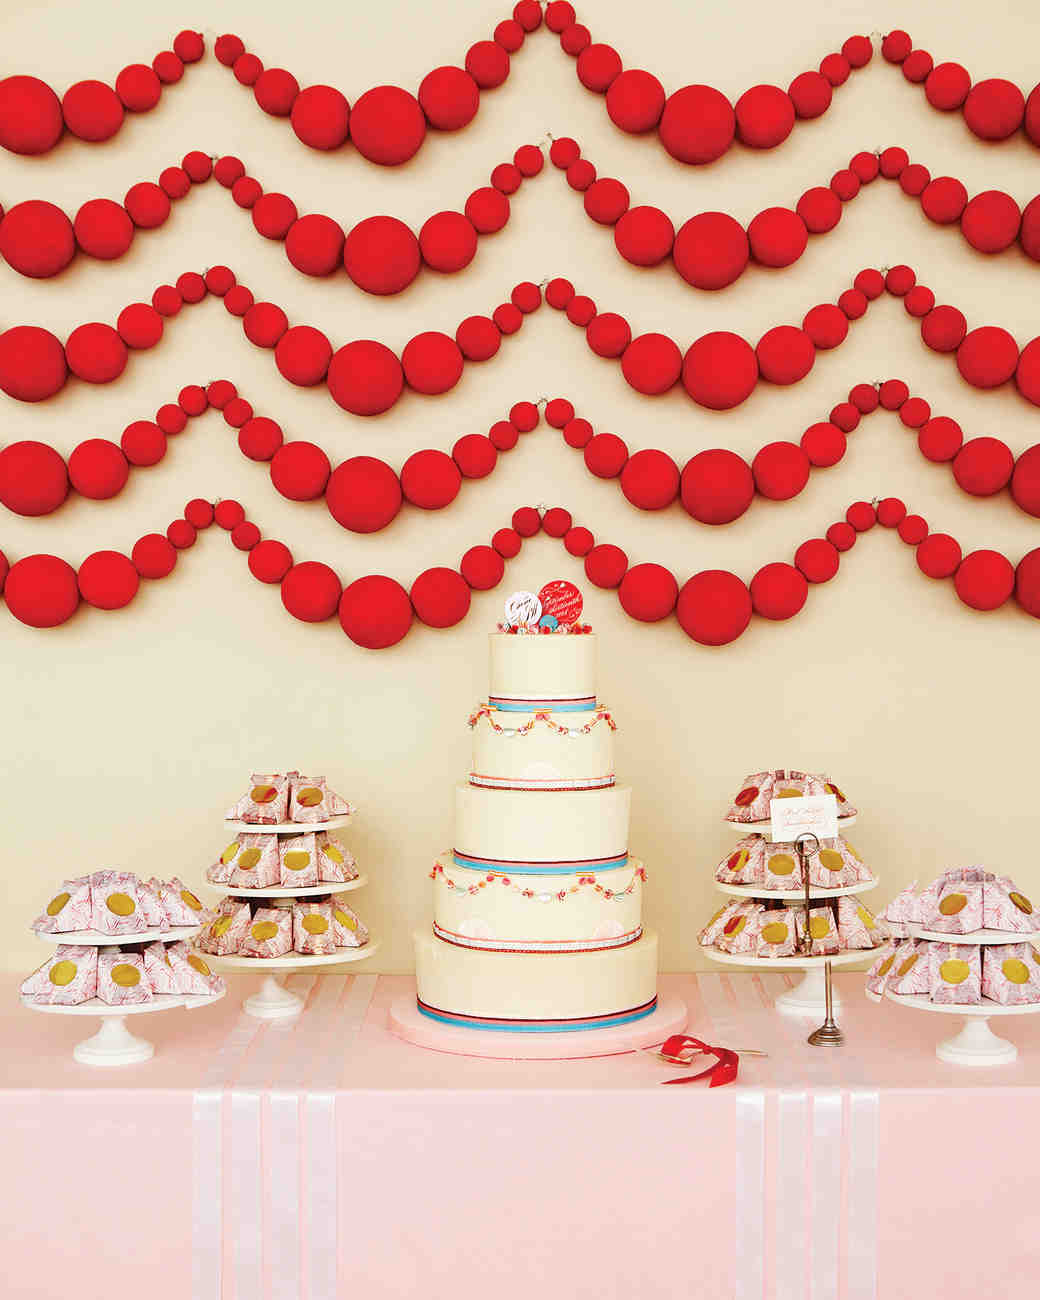 valentines-day-ideas-real-weddings-mwd104391-0115.jpg